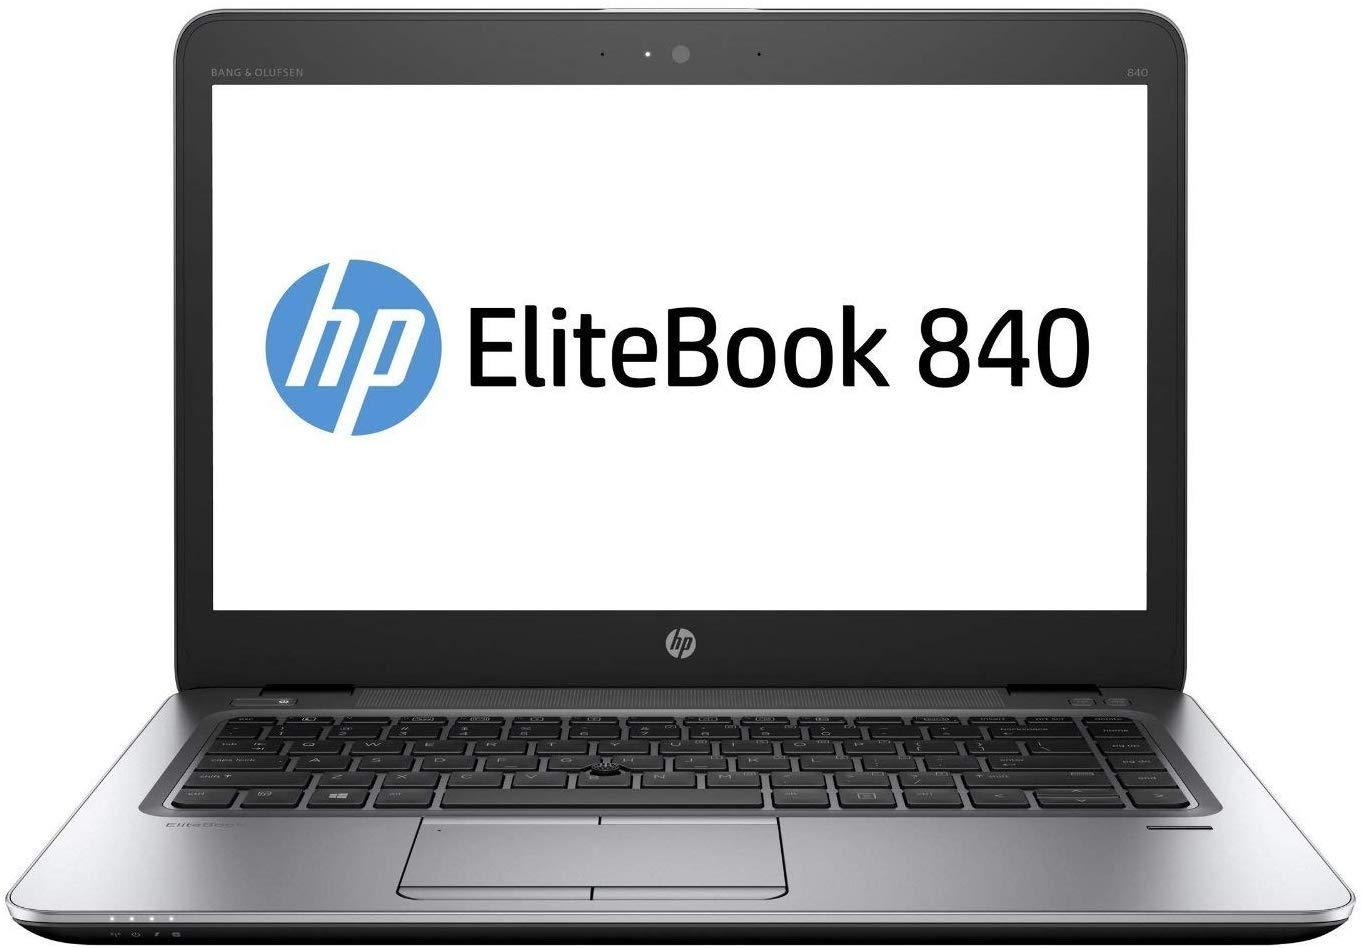 "HP EliteBook 840 G3 Laptop 14"" FHD Display Touch Screen, Intel Core i5 6300U 2.4Ghz, 256GB SSD , 8GB DDR4 RAM, Webcam, WiFi, Windows 10 Pro | Nairobi Computer Shop"